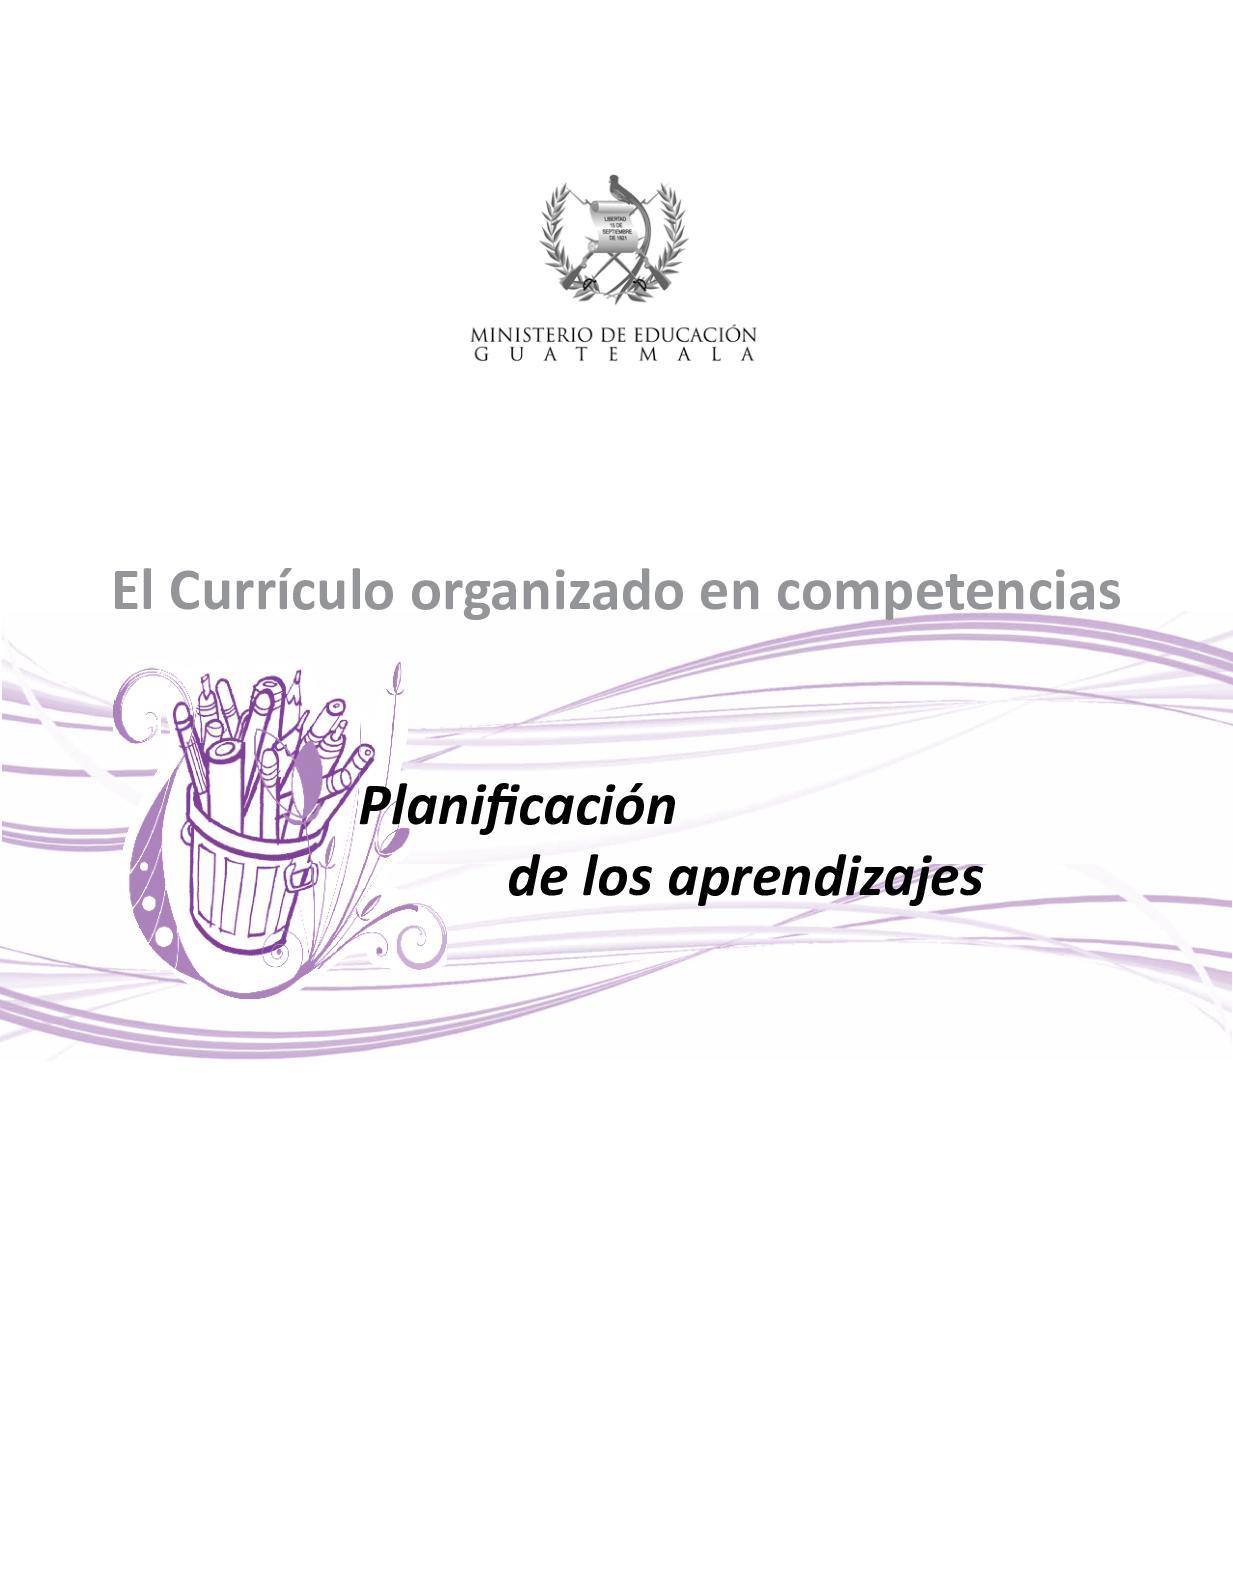 5 Planificacion